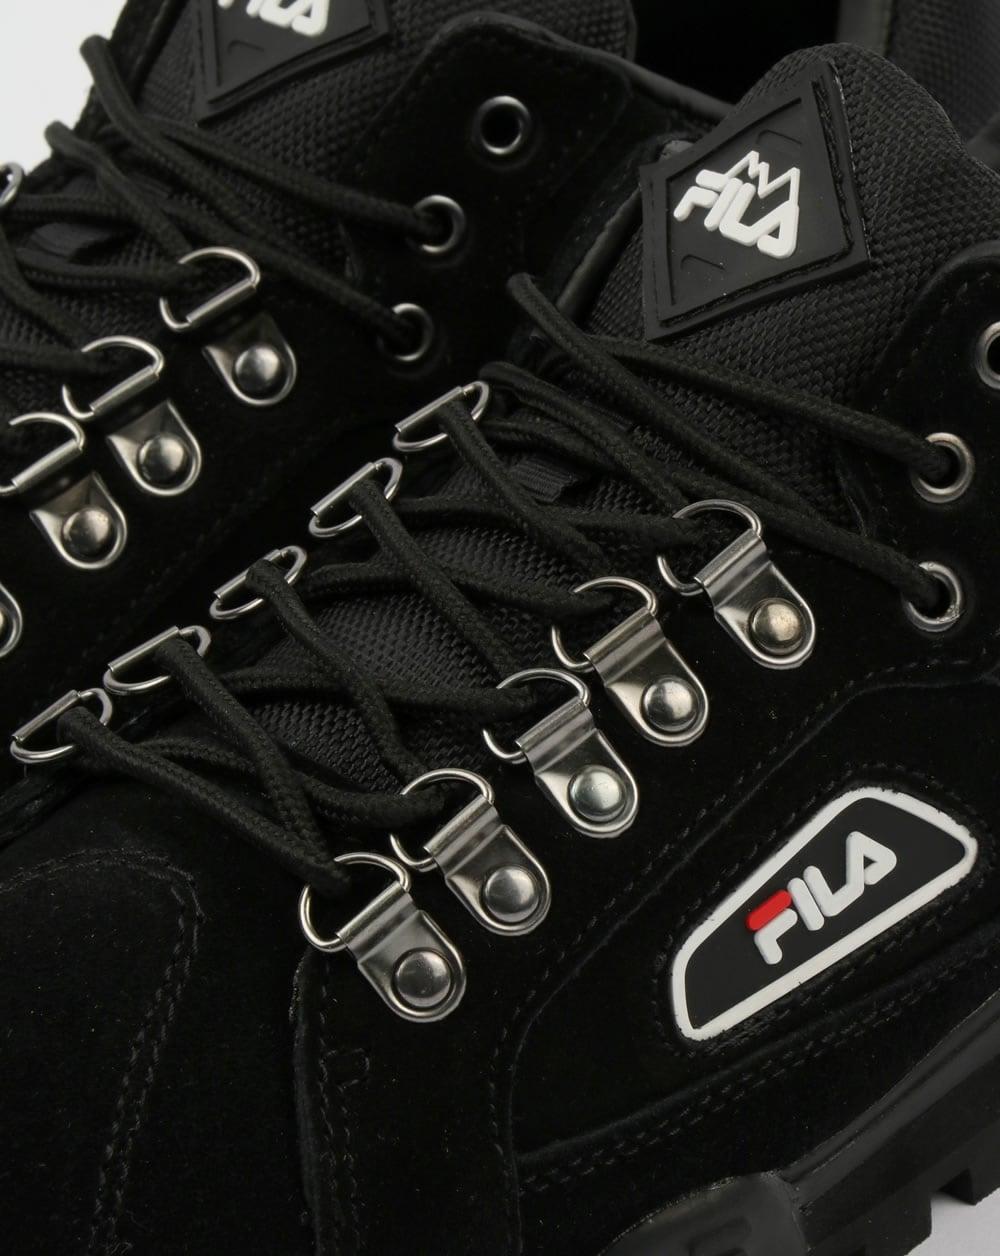 Fila Vintage Trailblazer Suede Boots Black Hiking Mens Biking